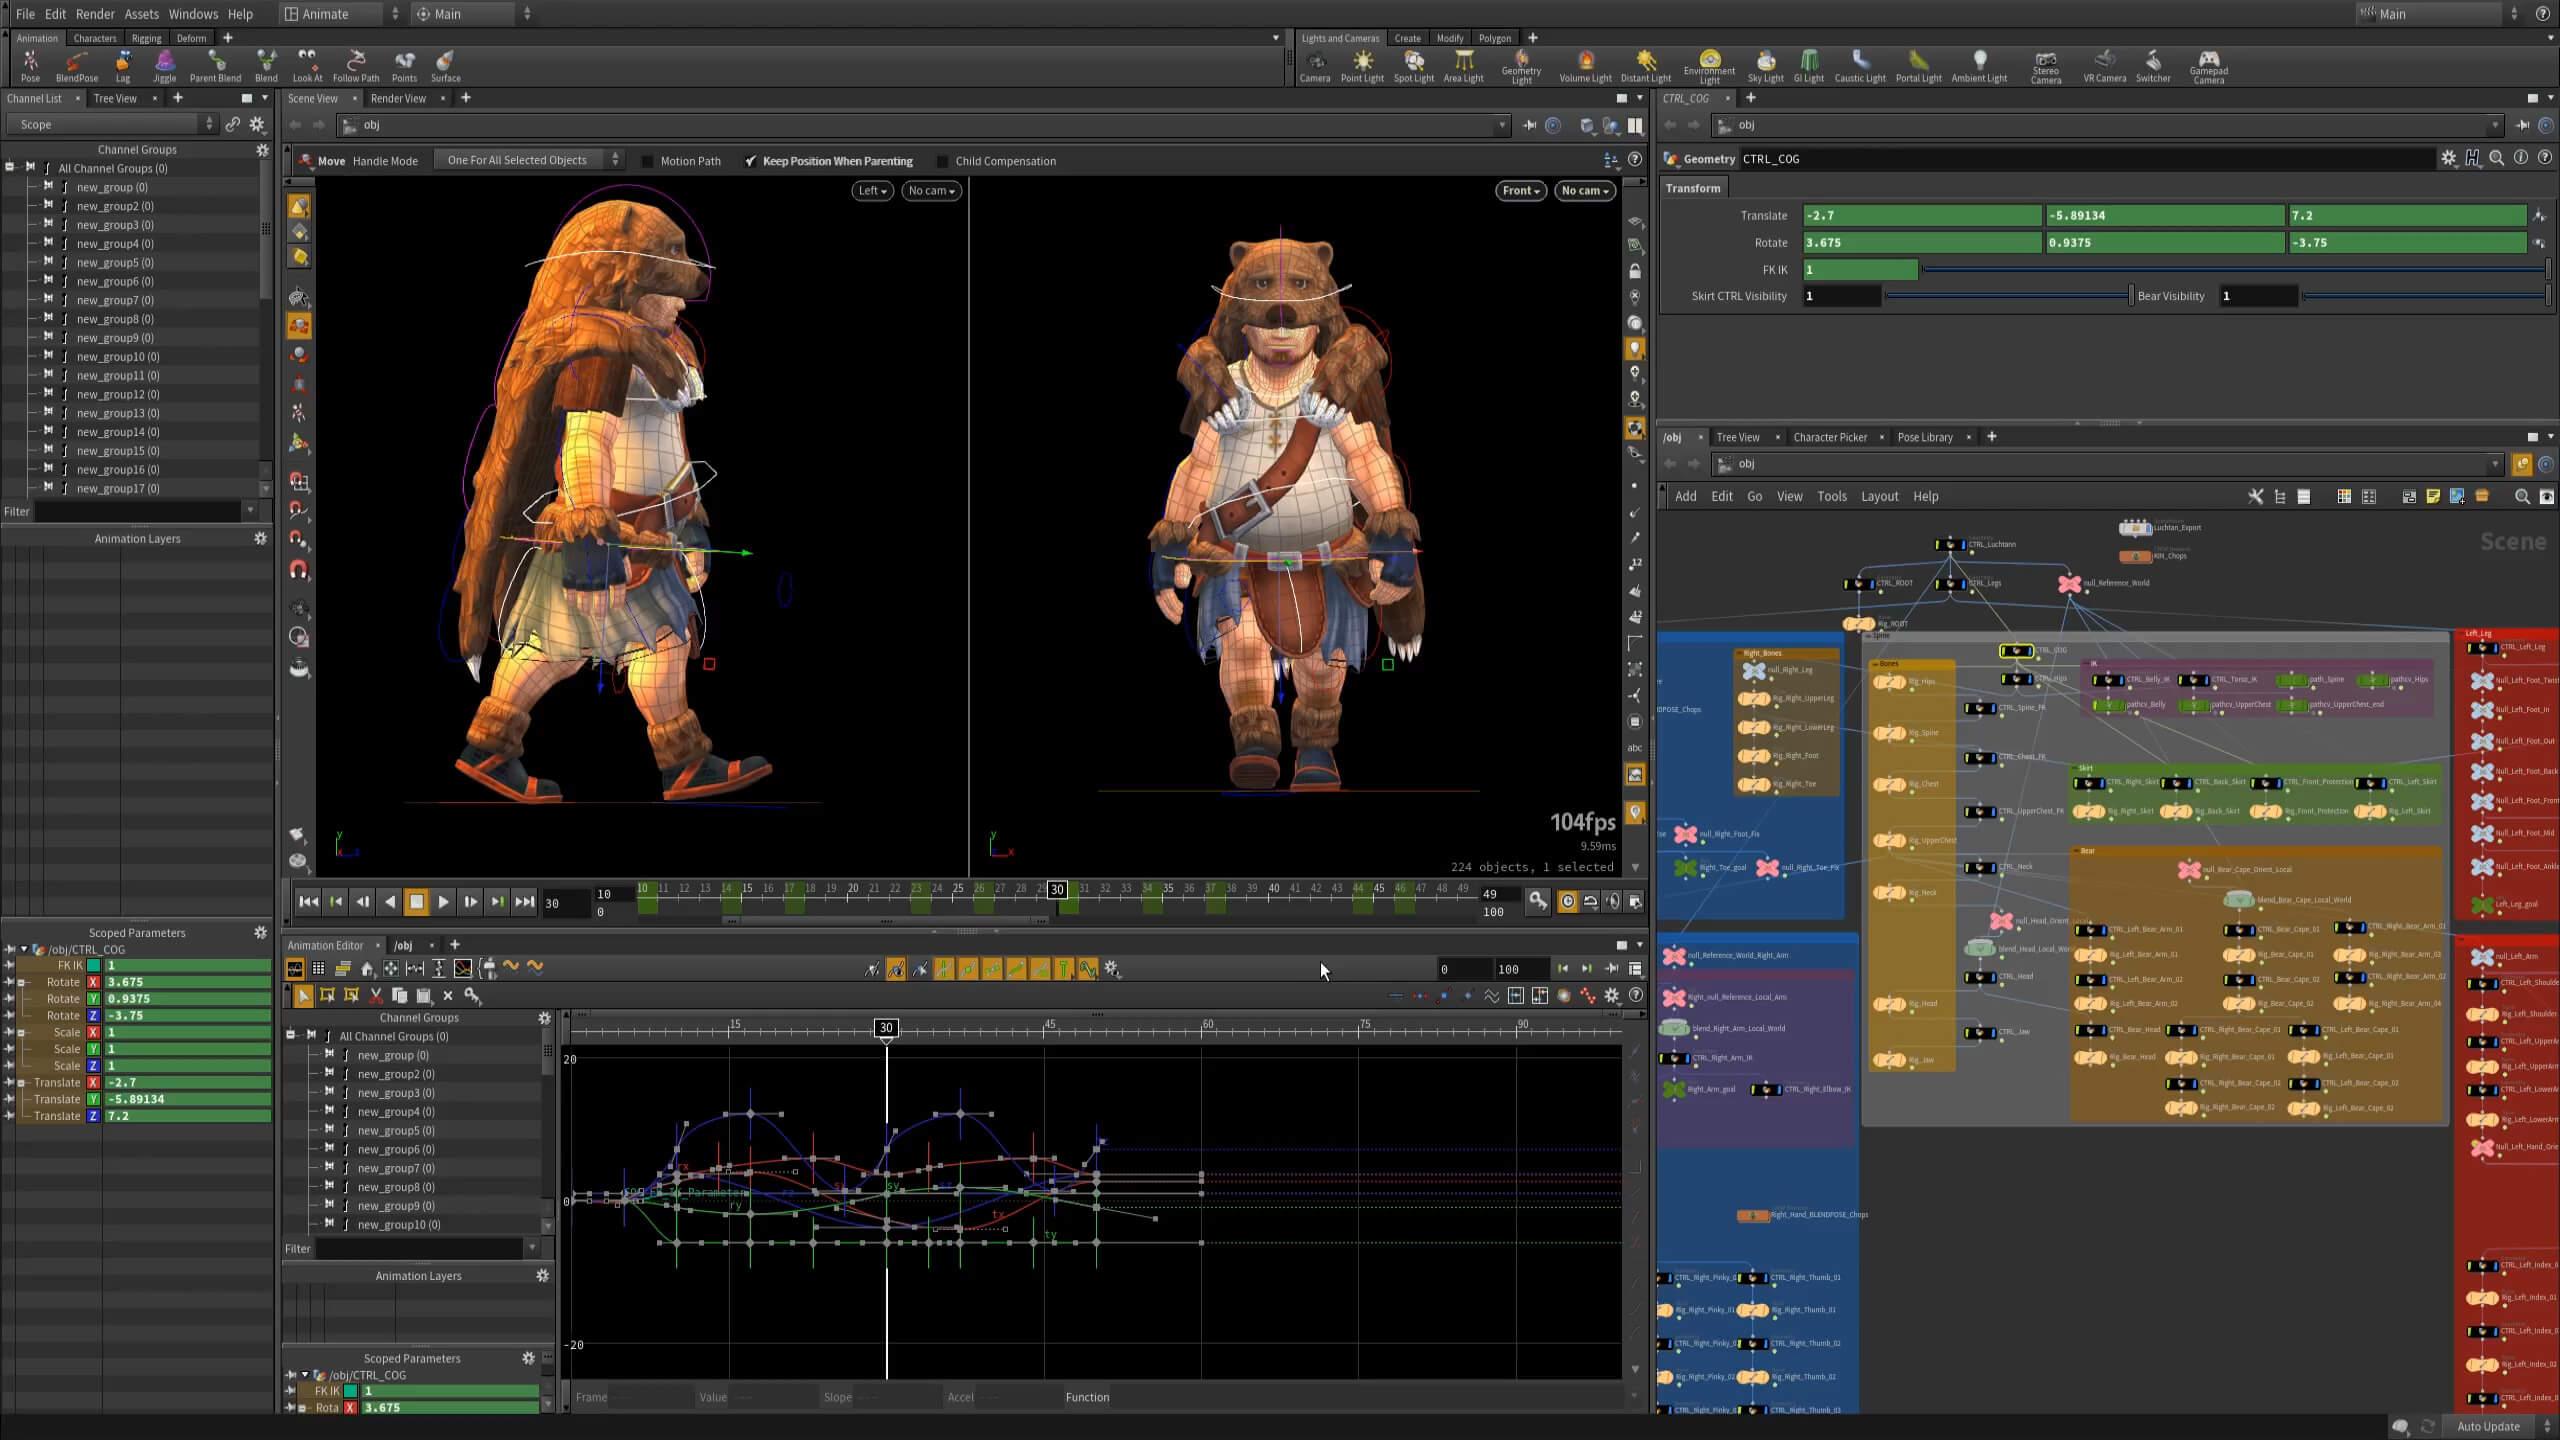 Houdini 17.5 3d modeling software